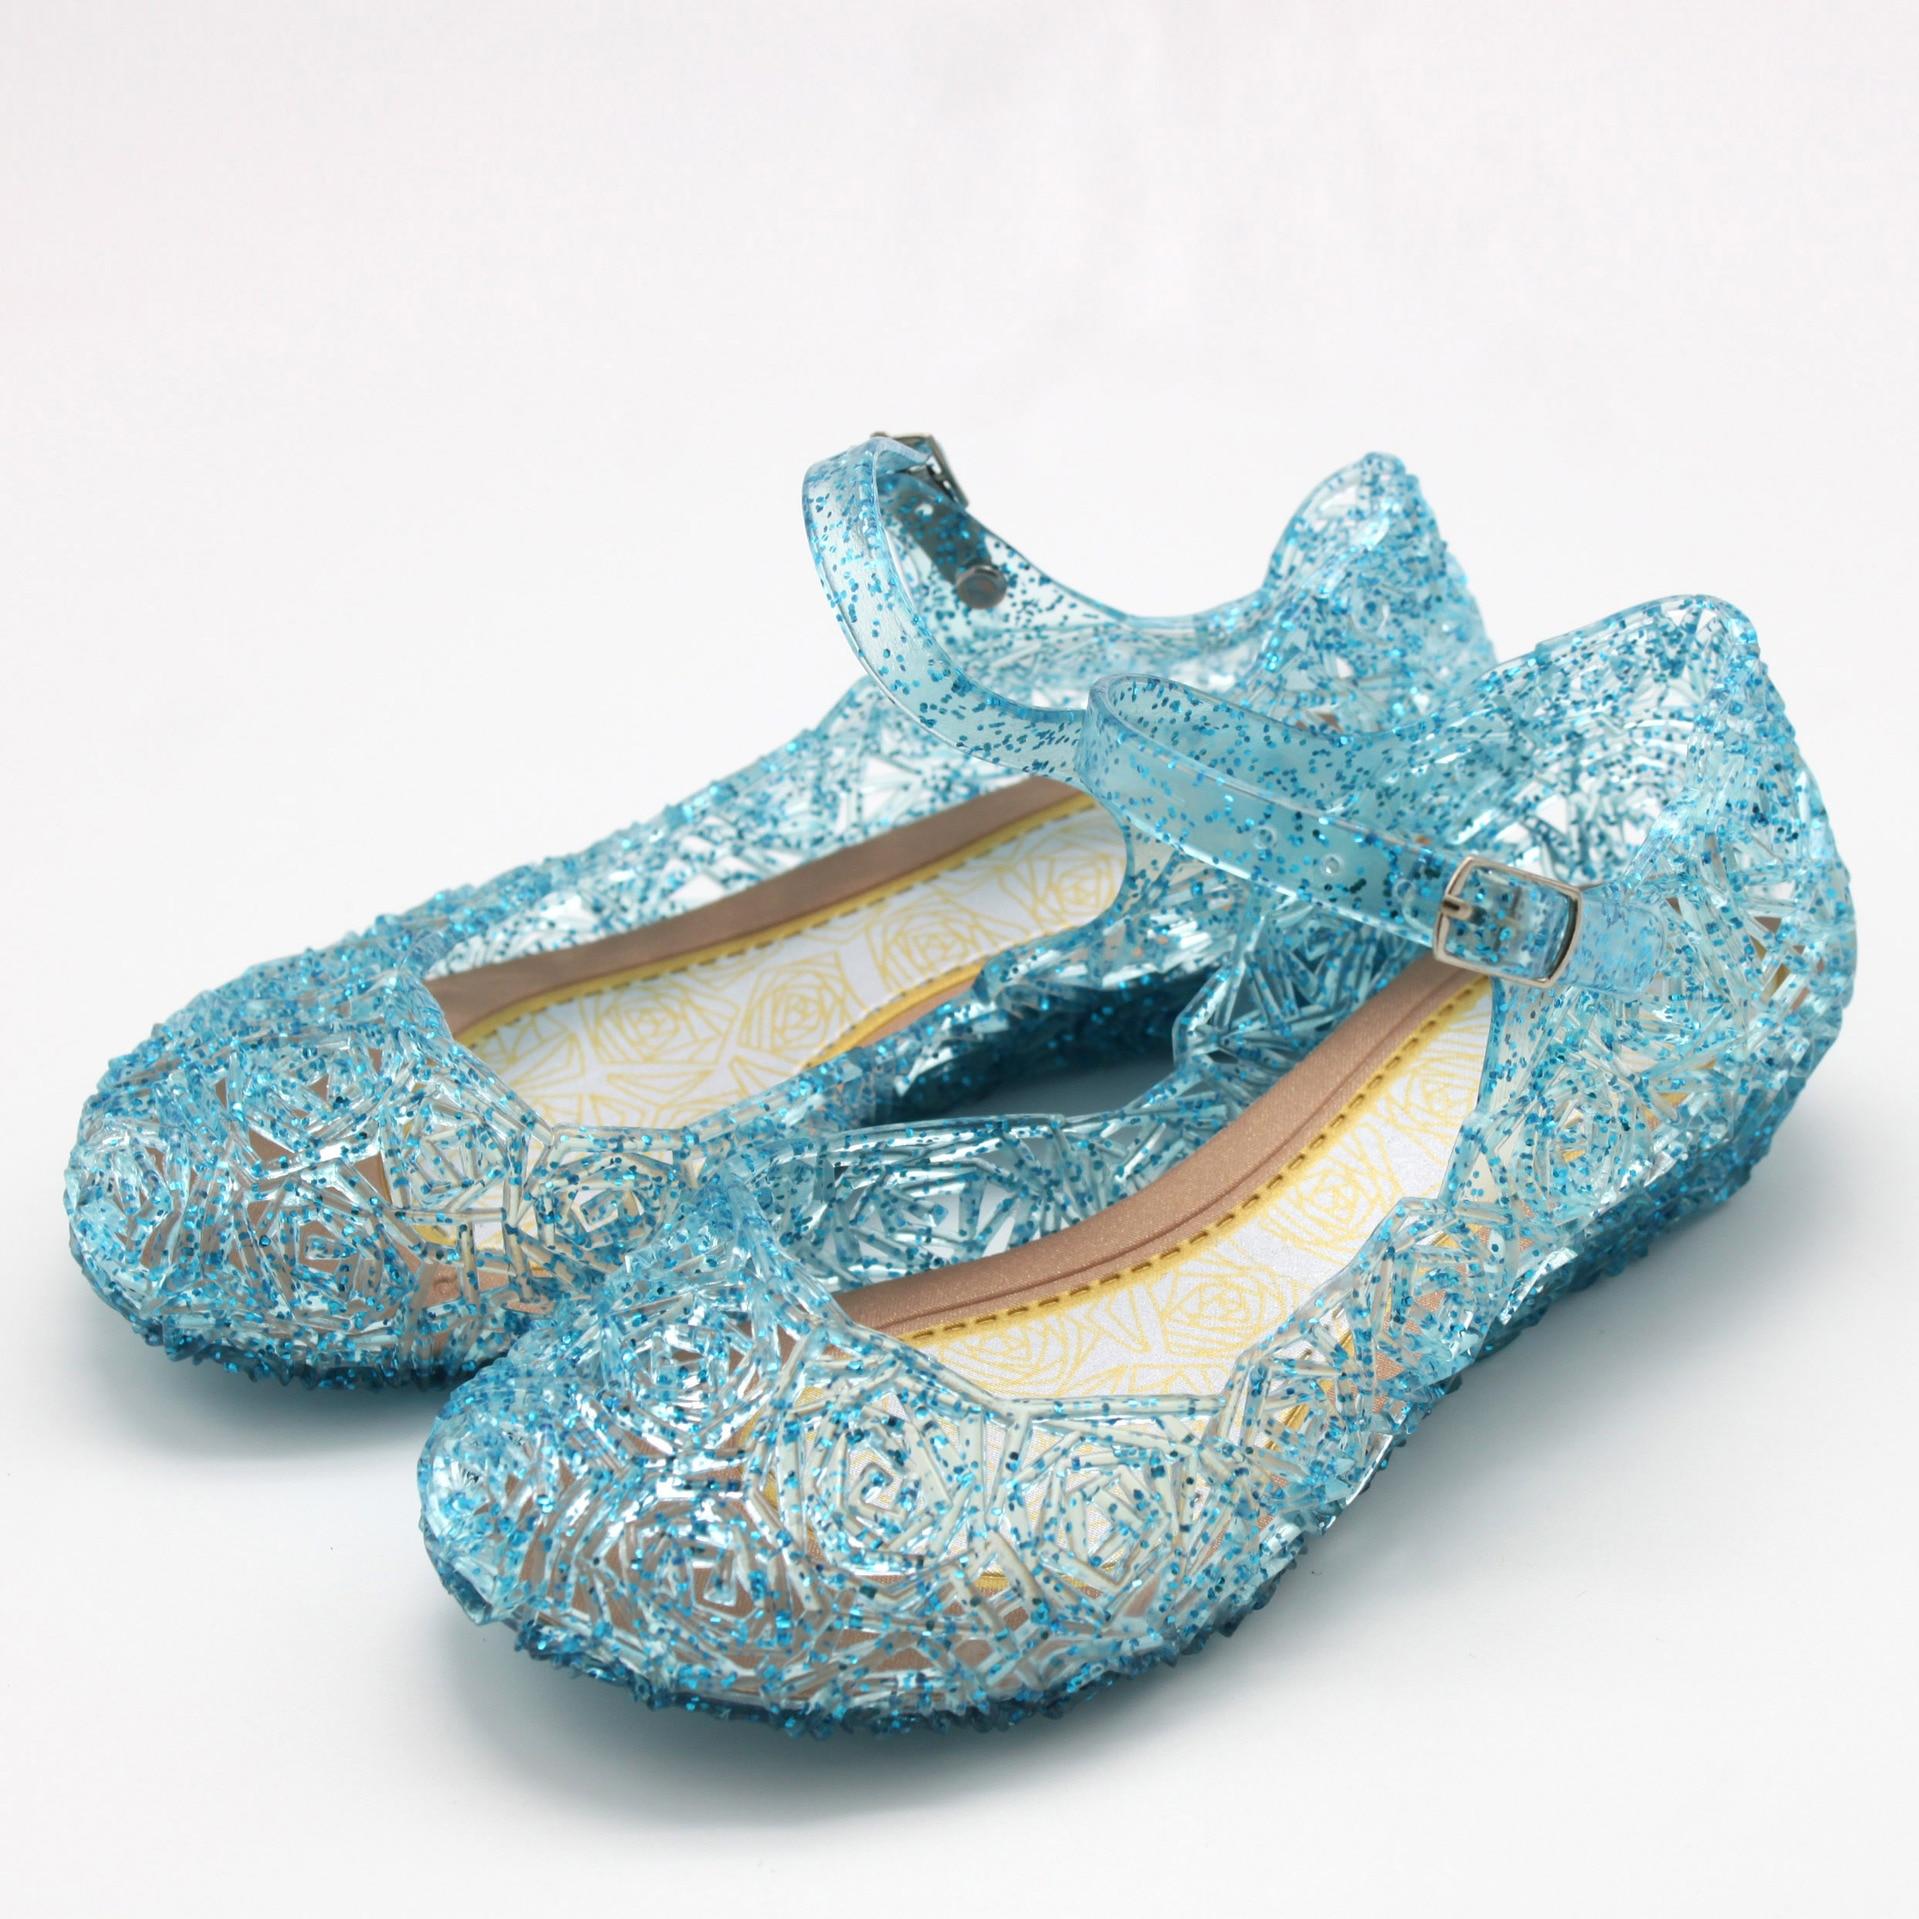 Princesa Anna Elsa zapatos Cenicienta cristal disfraz Zapatos Bebé niñas Cosplay traje sandalias fiesta